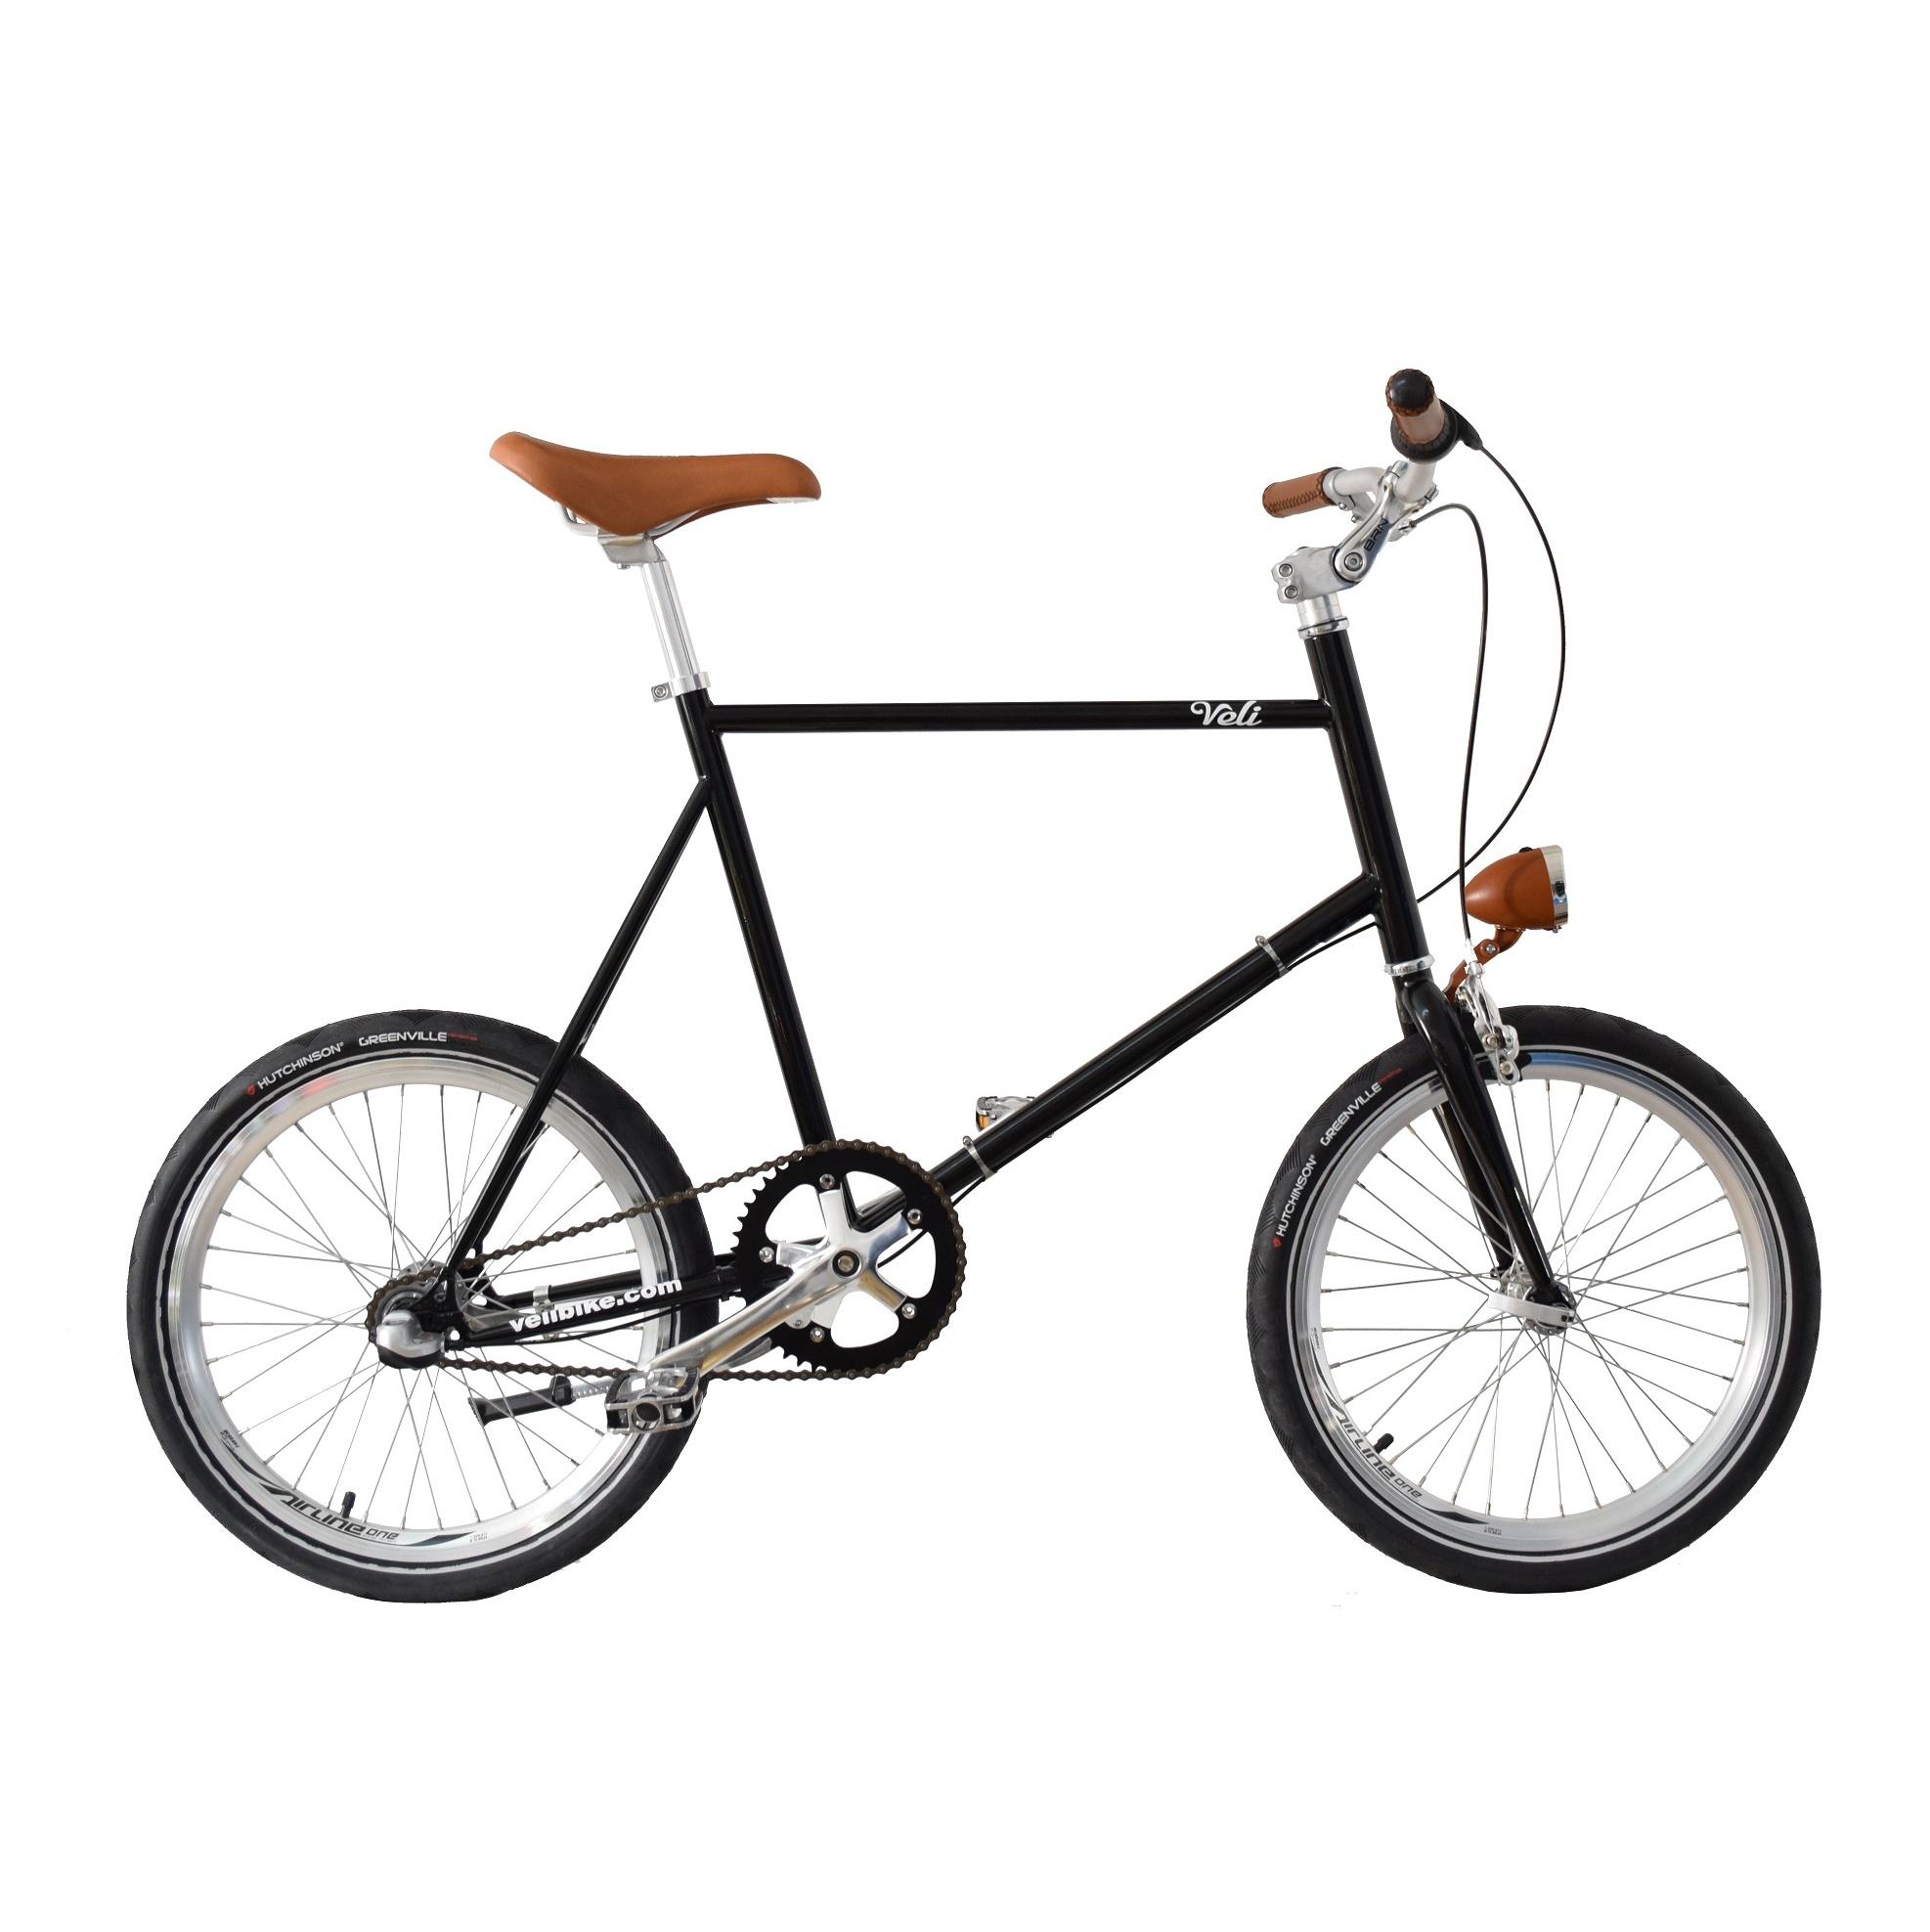 Veli bike